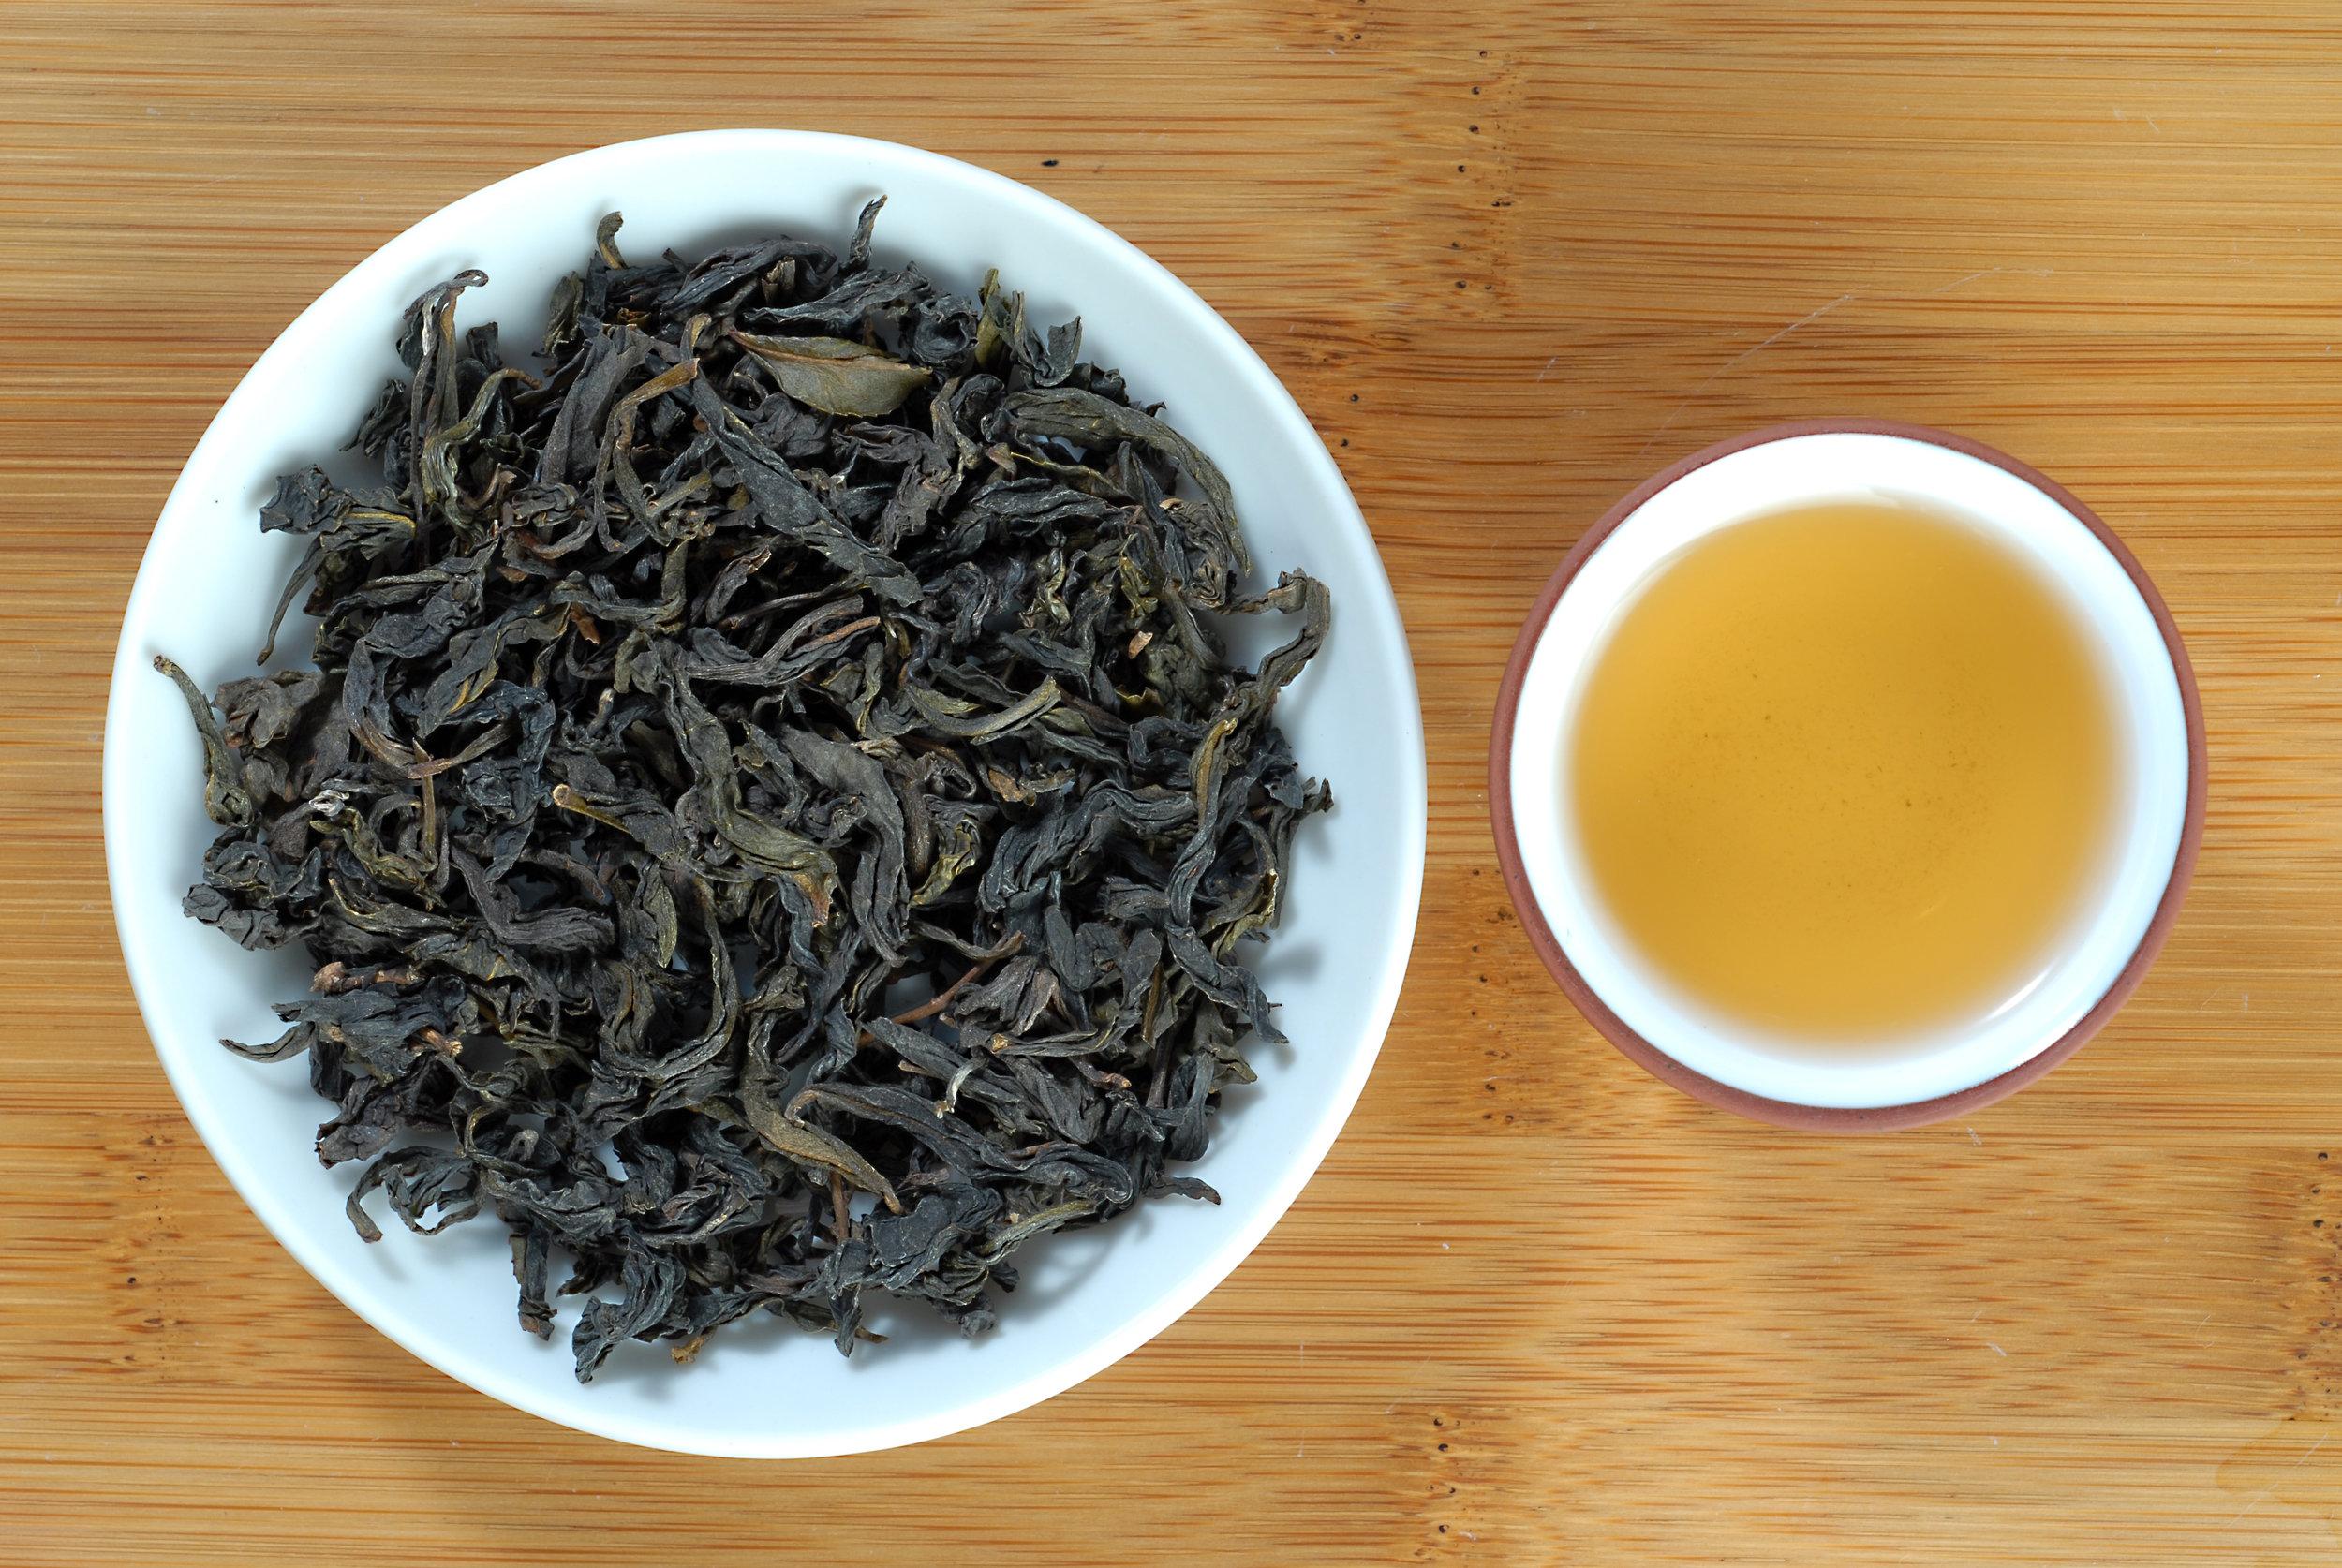 有記名茶奇種烏龍-包種茶 Chi Chong Oolong-Pouchong Tea